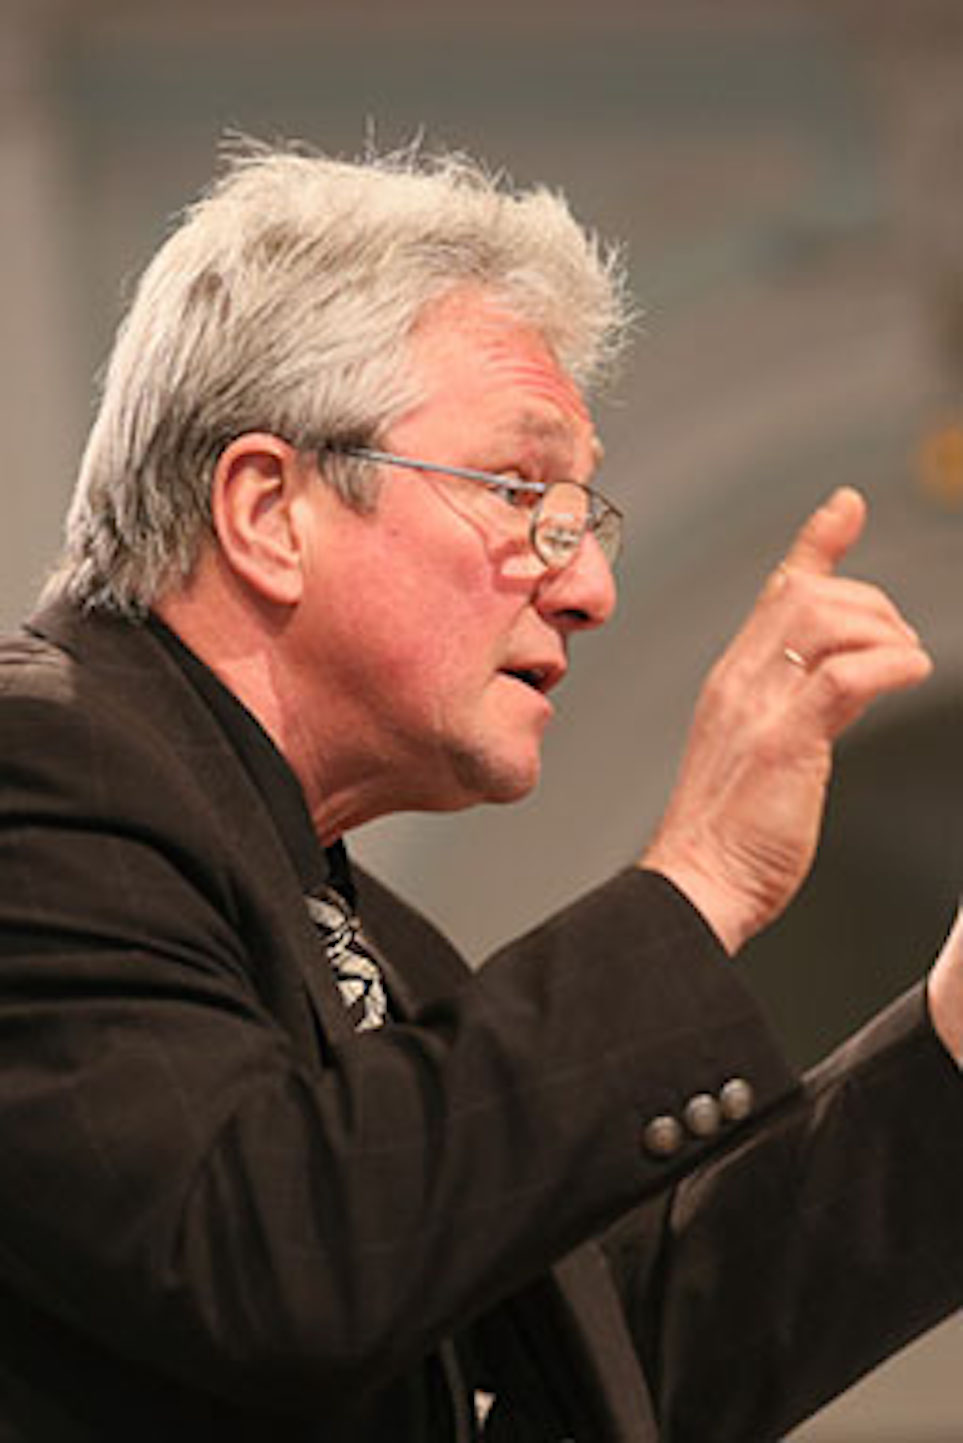 renowned composer Vytautas Miskinis